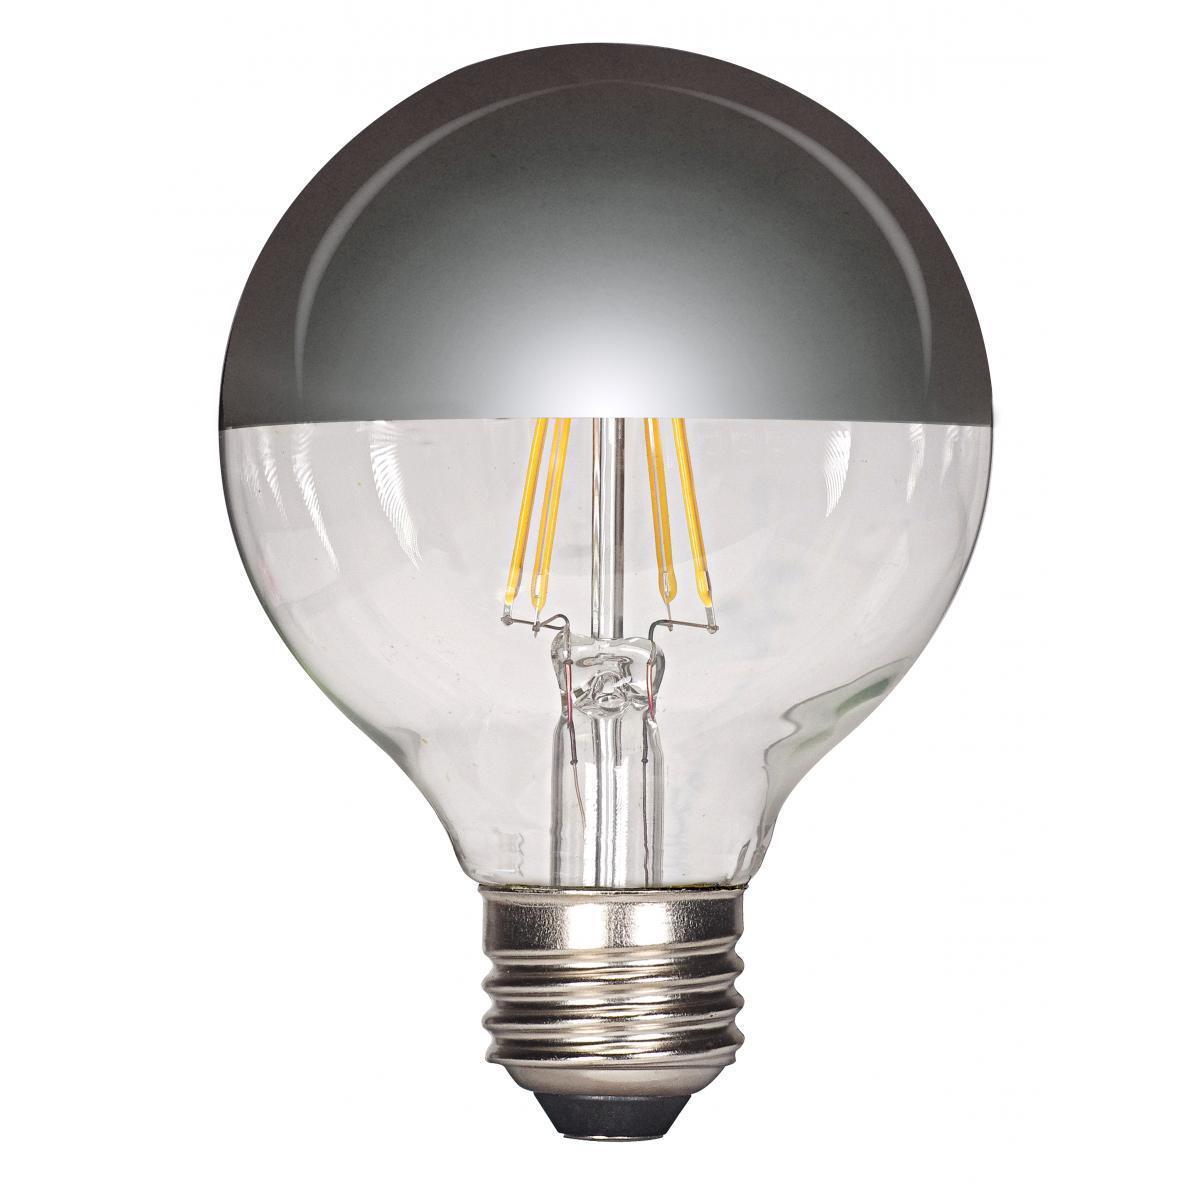 SATCO 4.5W LED G25 Globe - Silver Crown - Medium Base - 2...